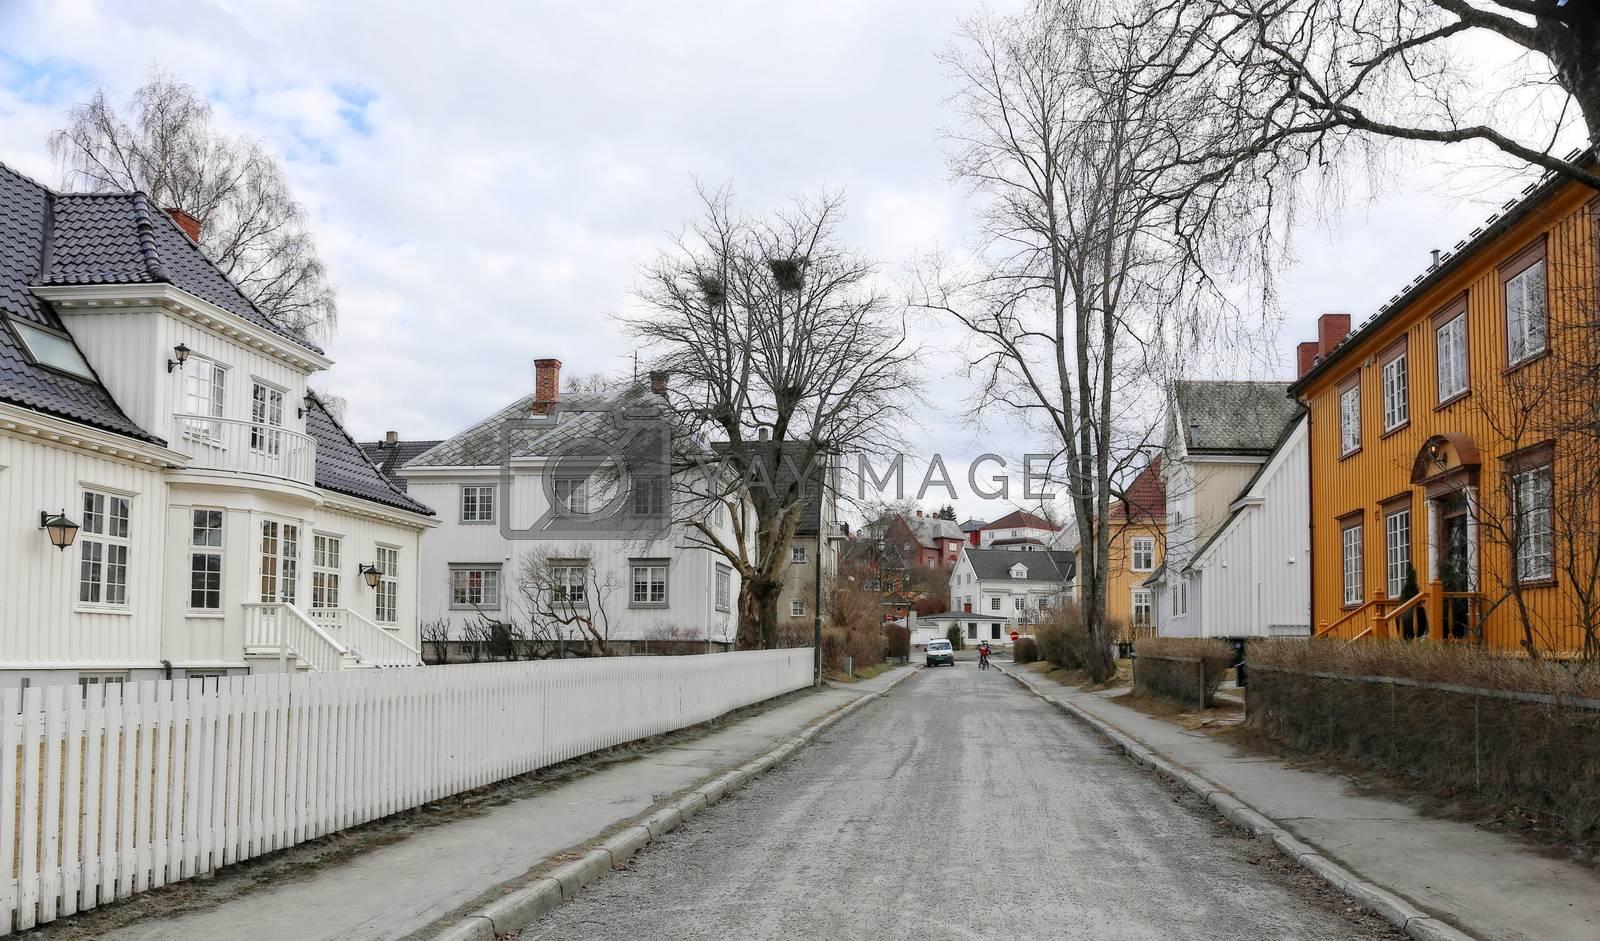 Rundtur i Trondheim en vårdag - Singsaker